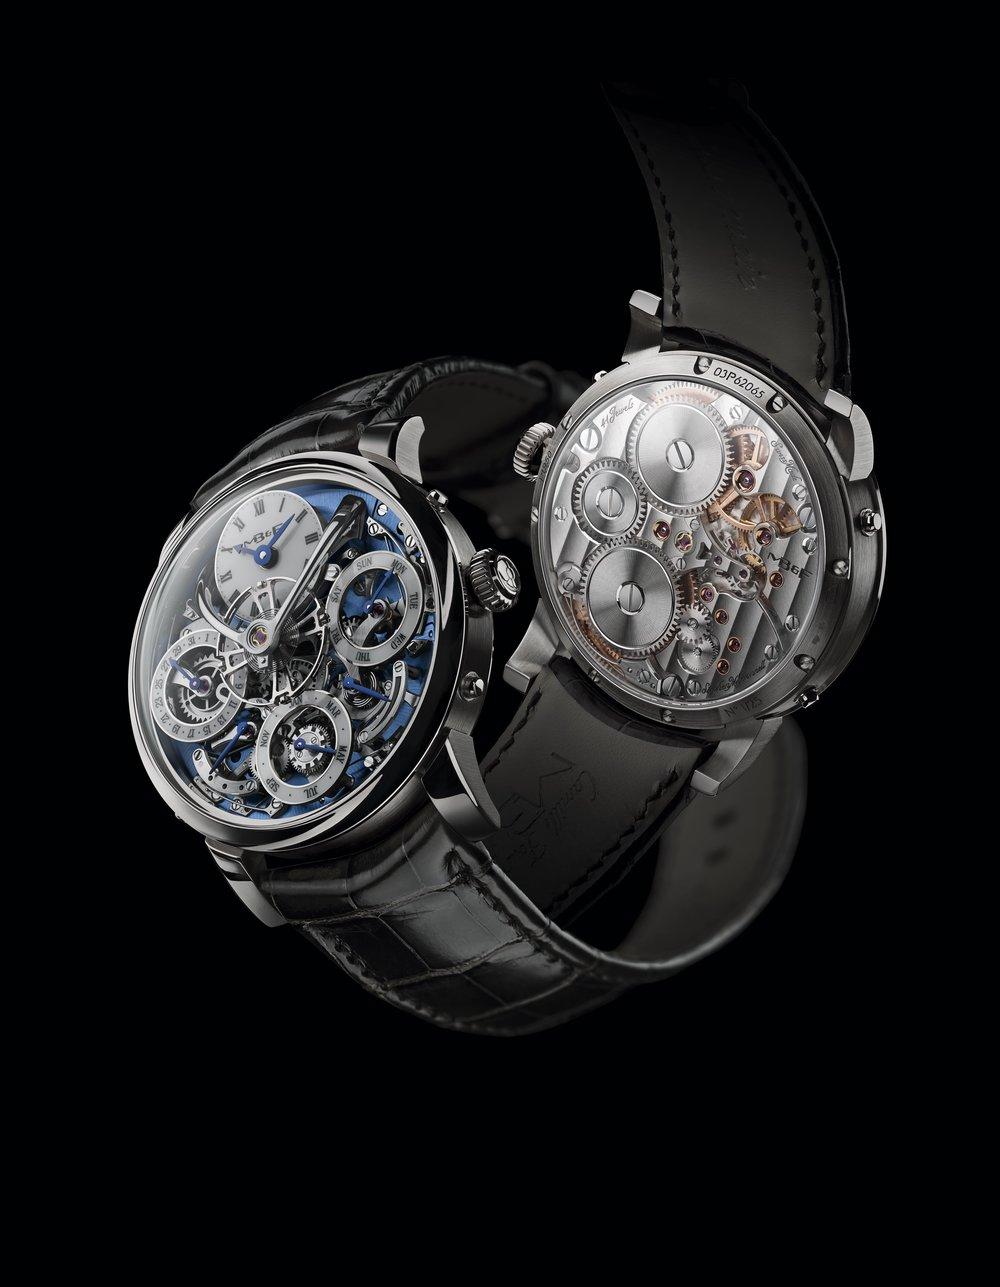 Calendar Watch Prize: